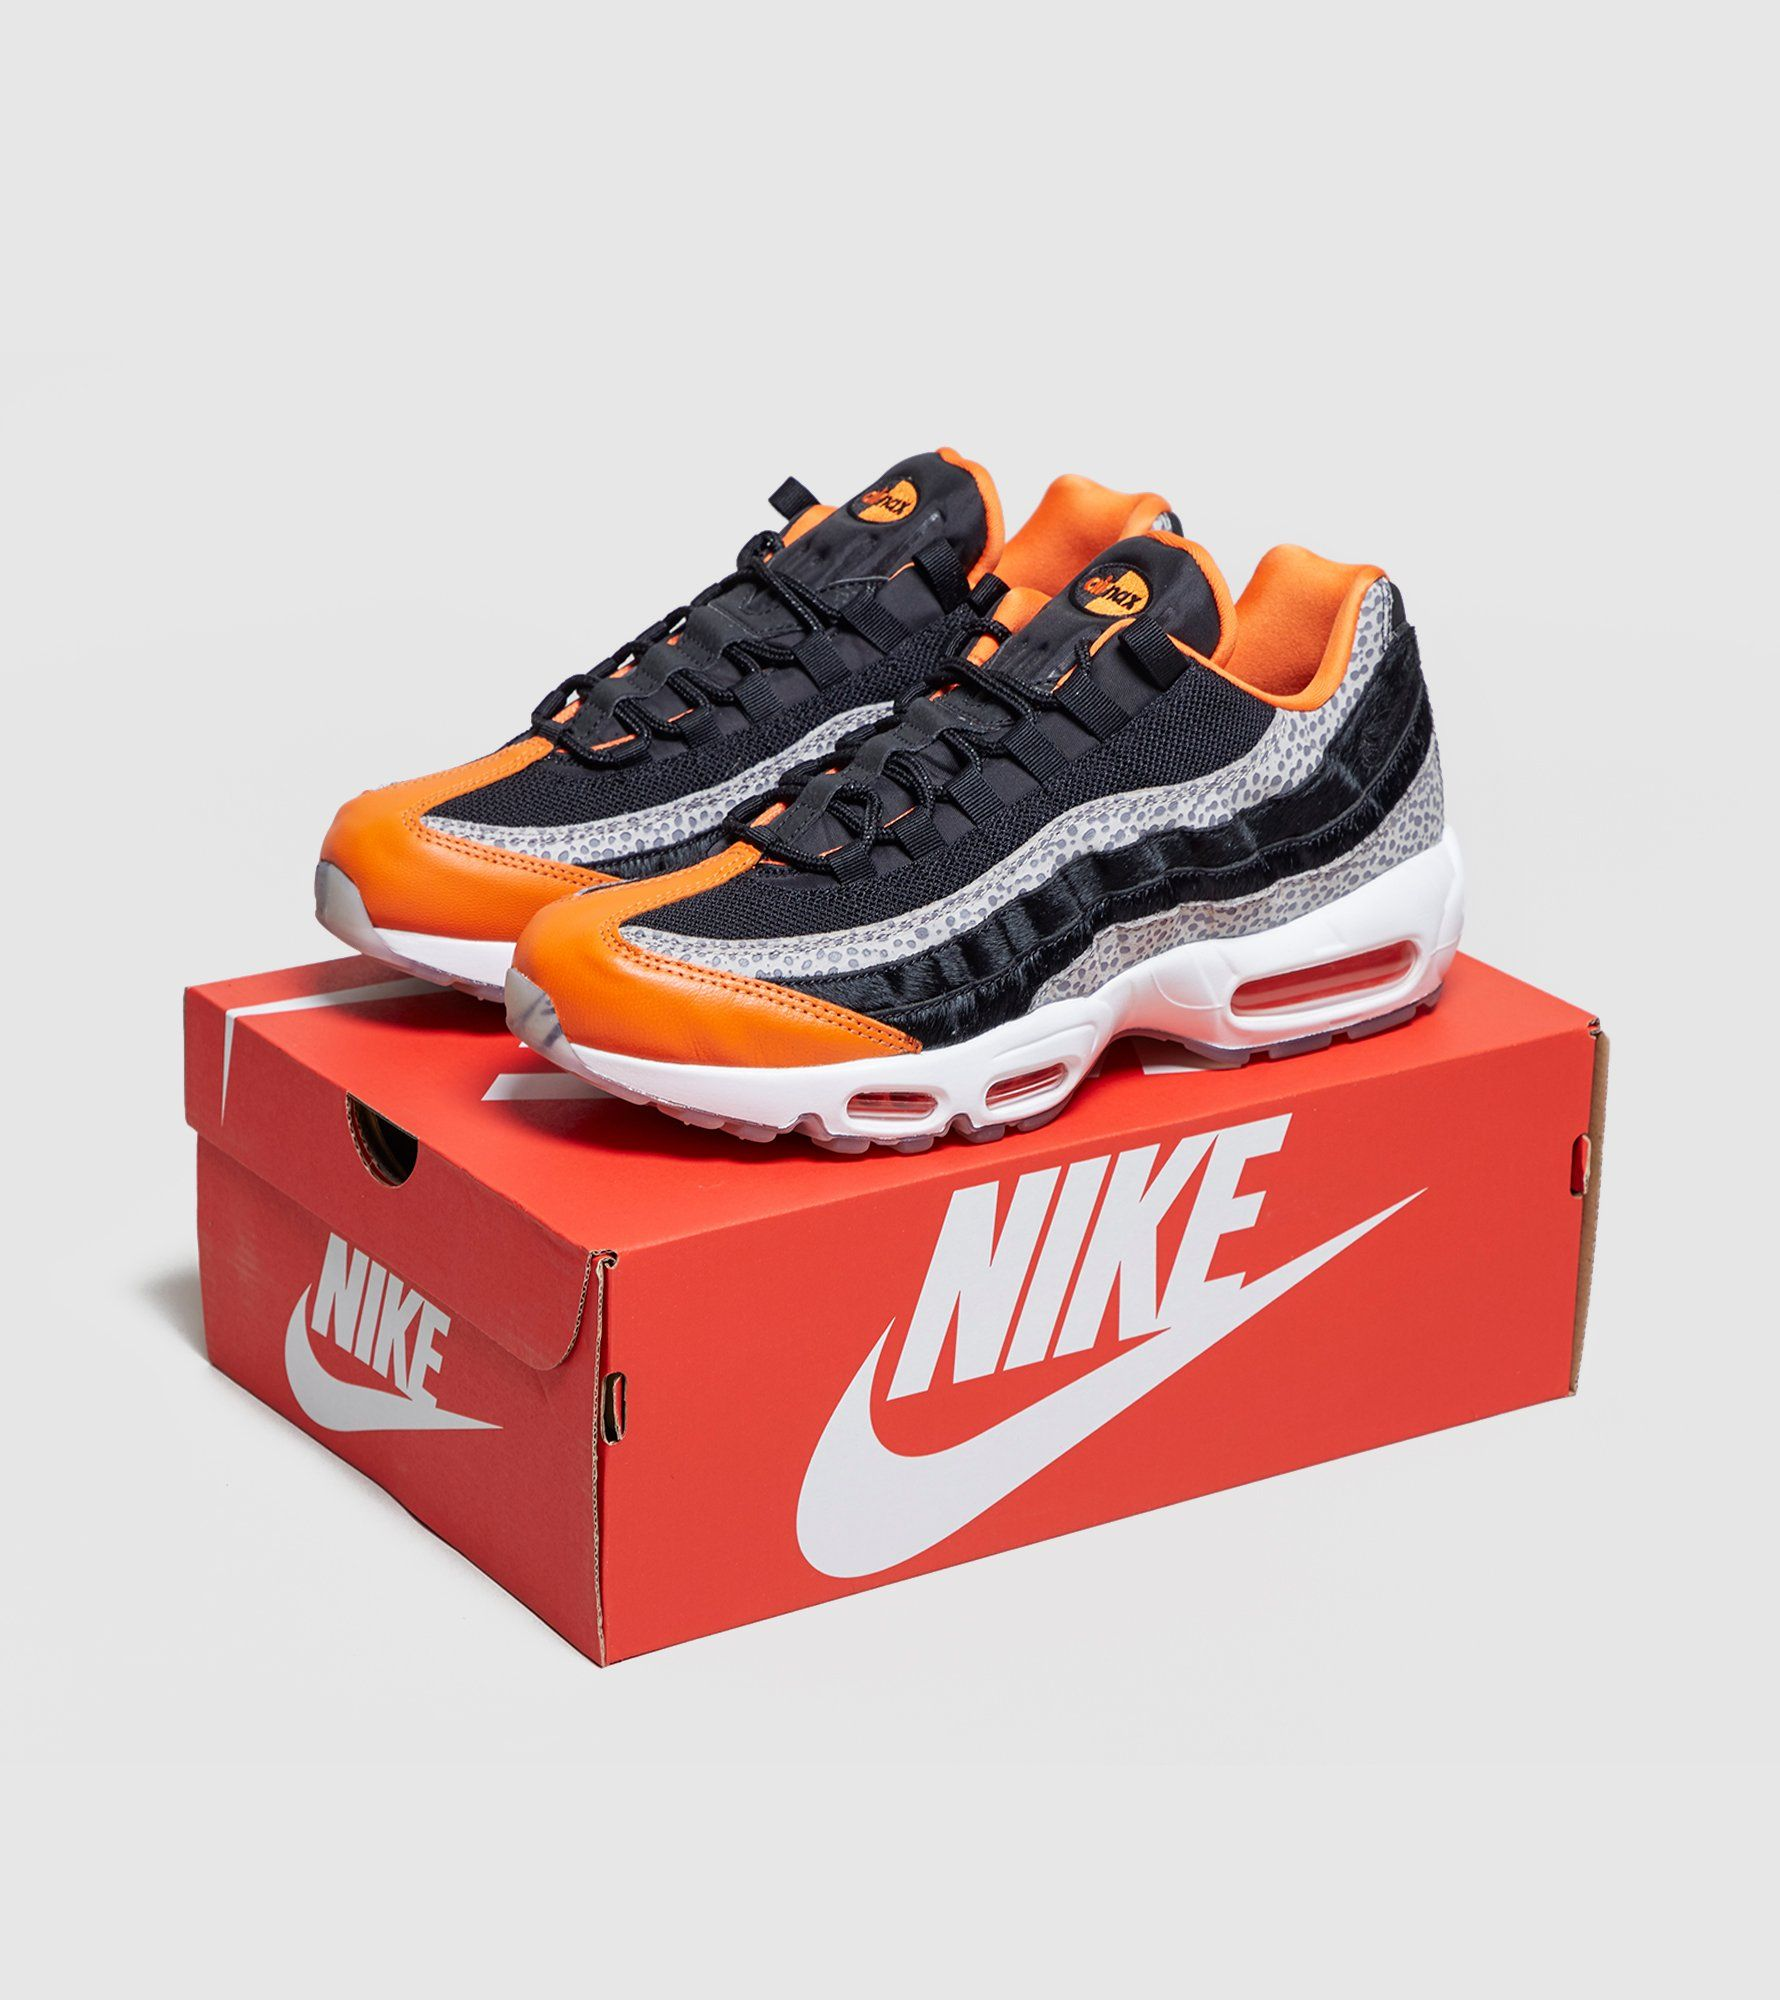 Nike Air Max 95 'Greatest Hits' Pack